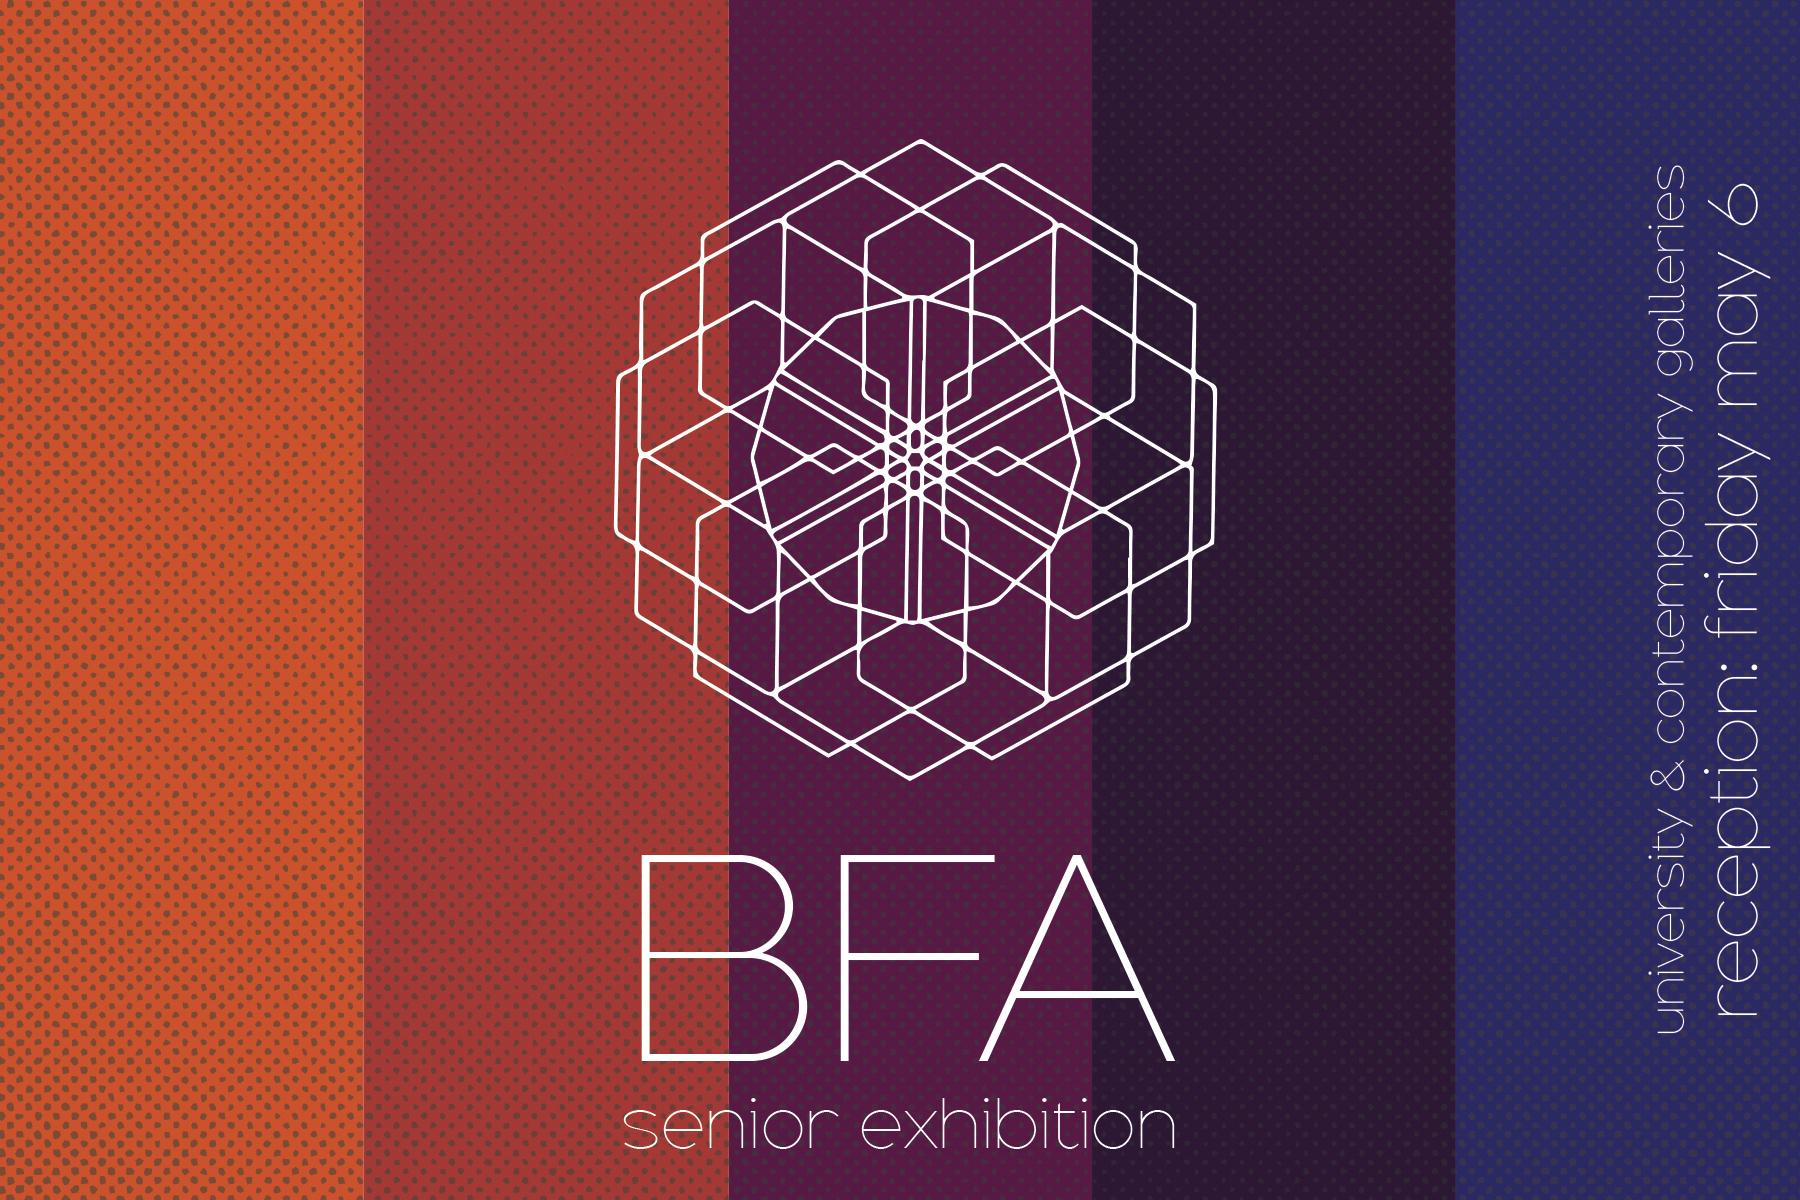 1461793080 bfa senior exhibition